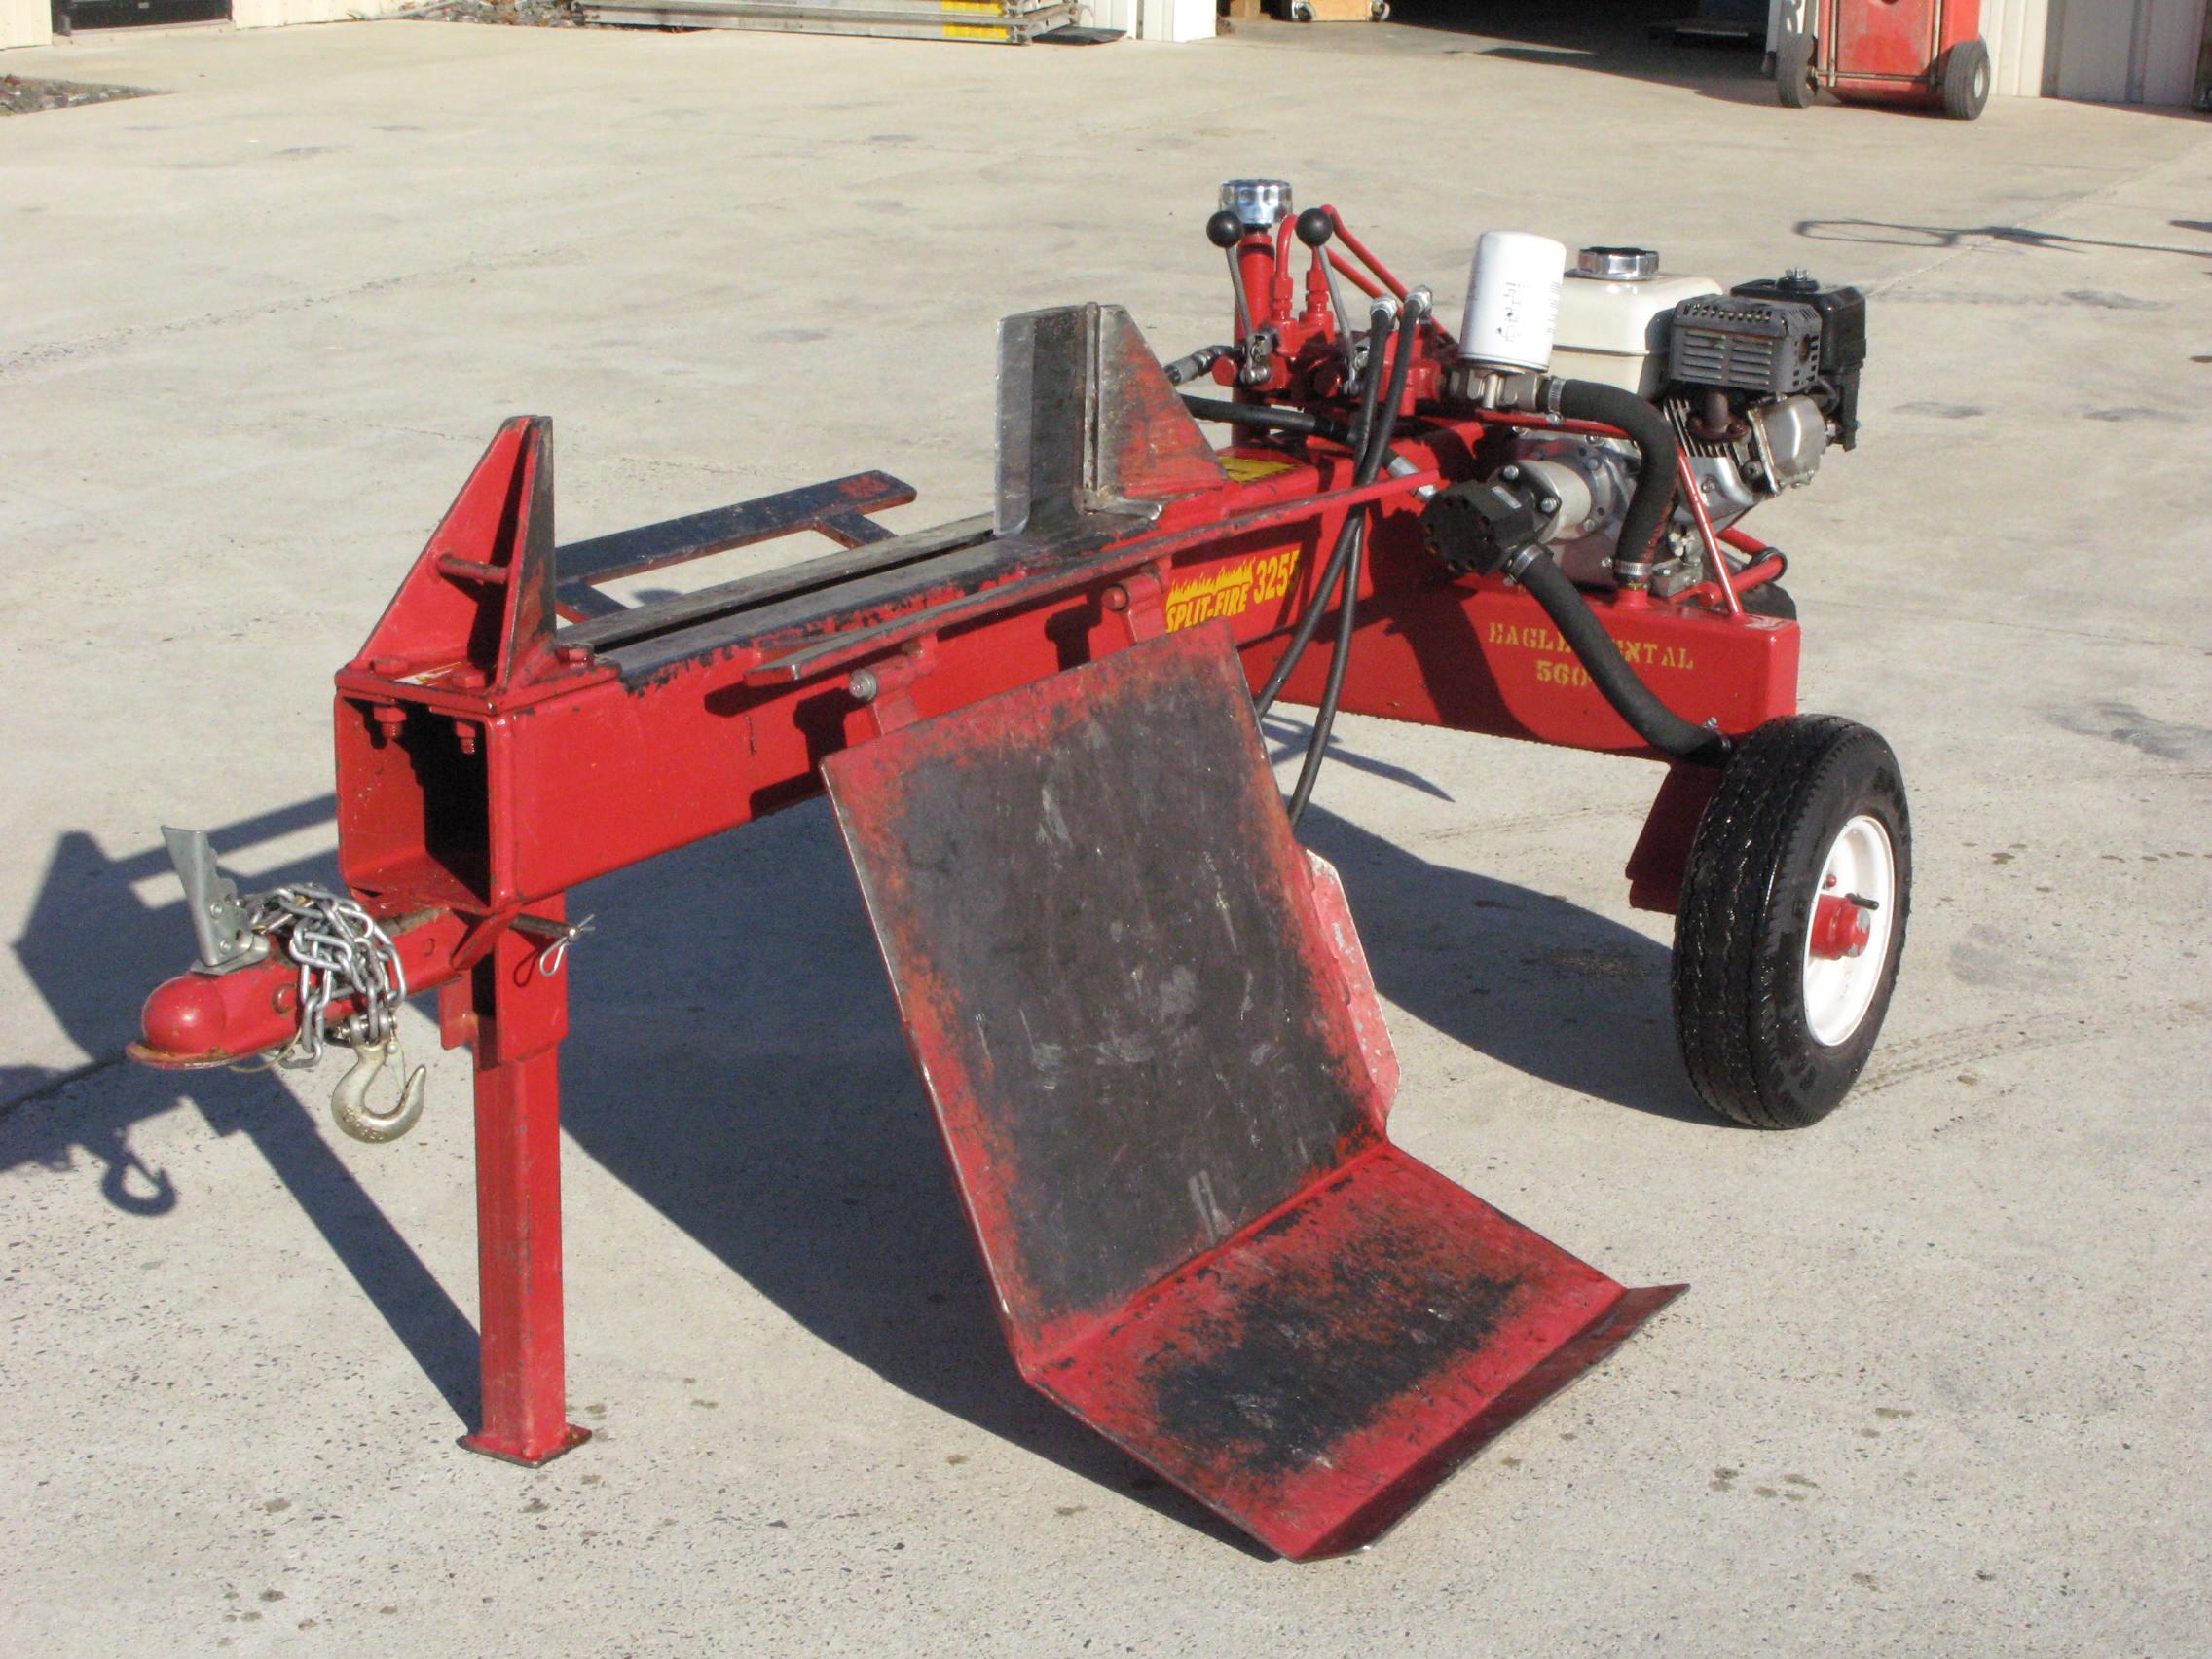 Wood Splitter With Lift : Woodsplitter hydraulic w lift kit eagle rental